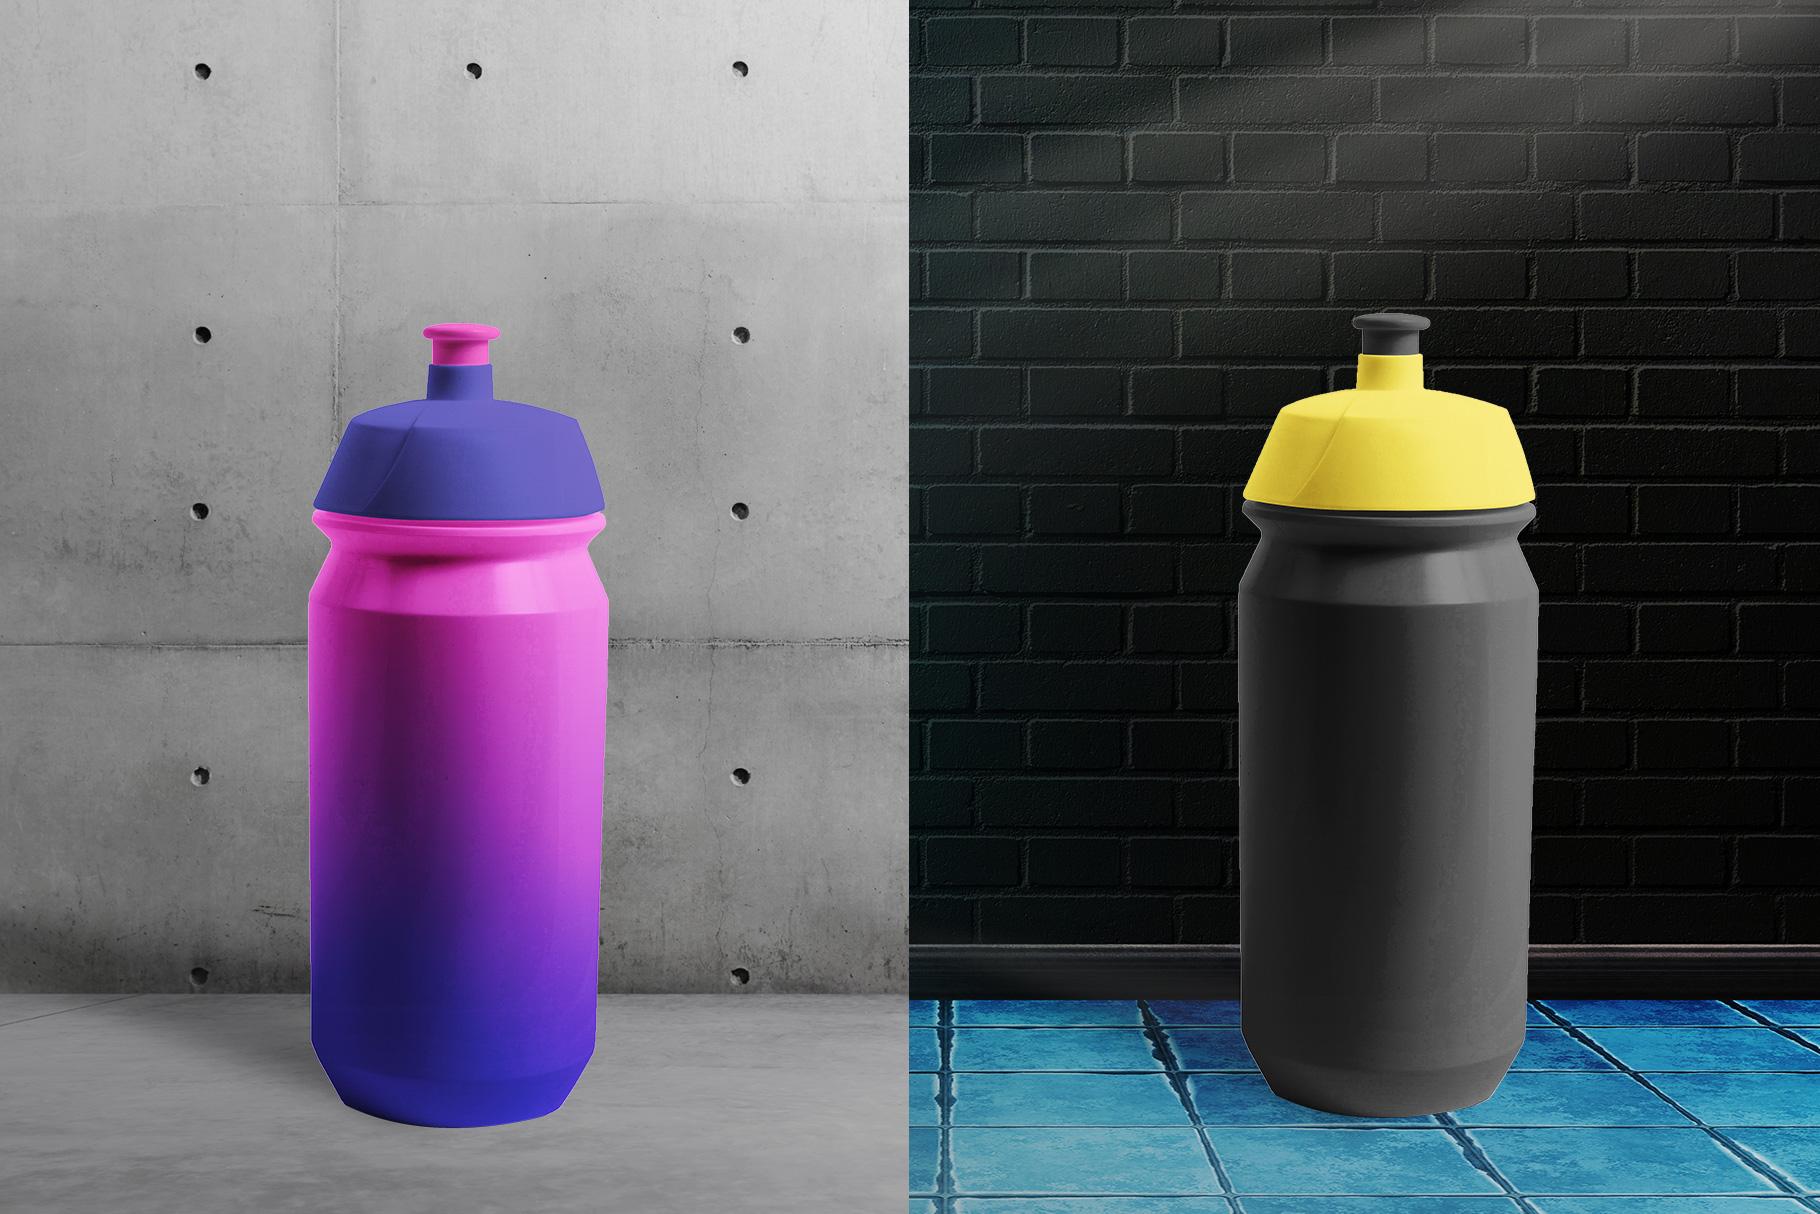 background options of the biker water bottle mockup